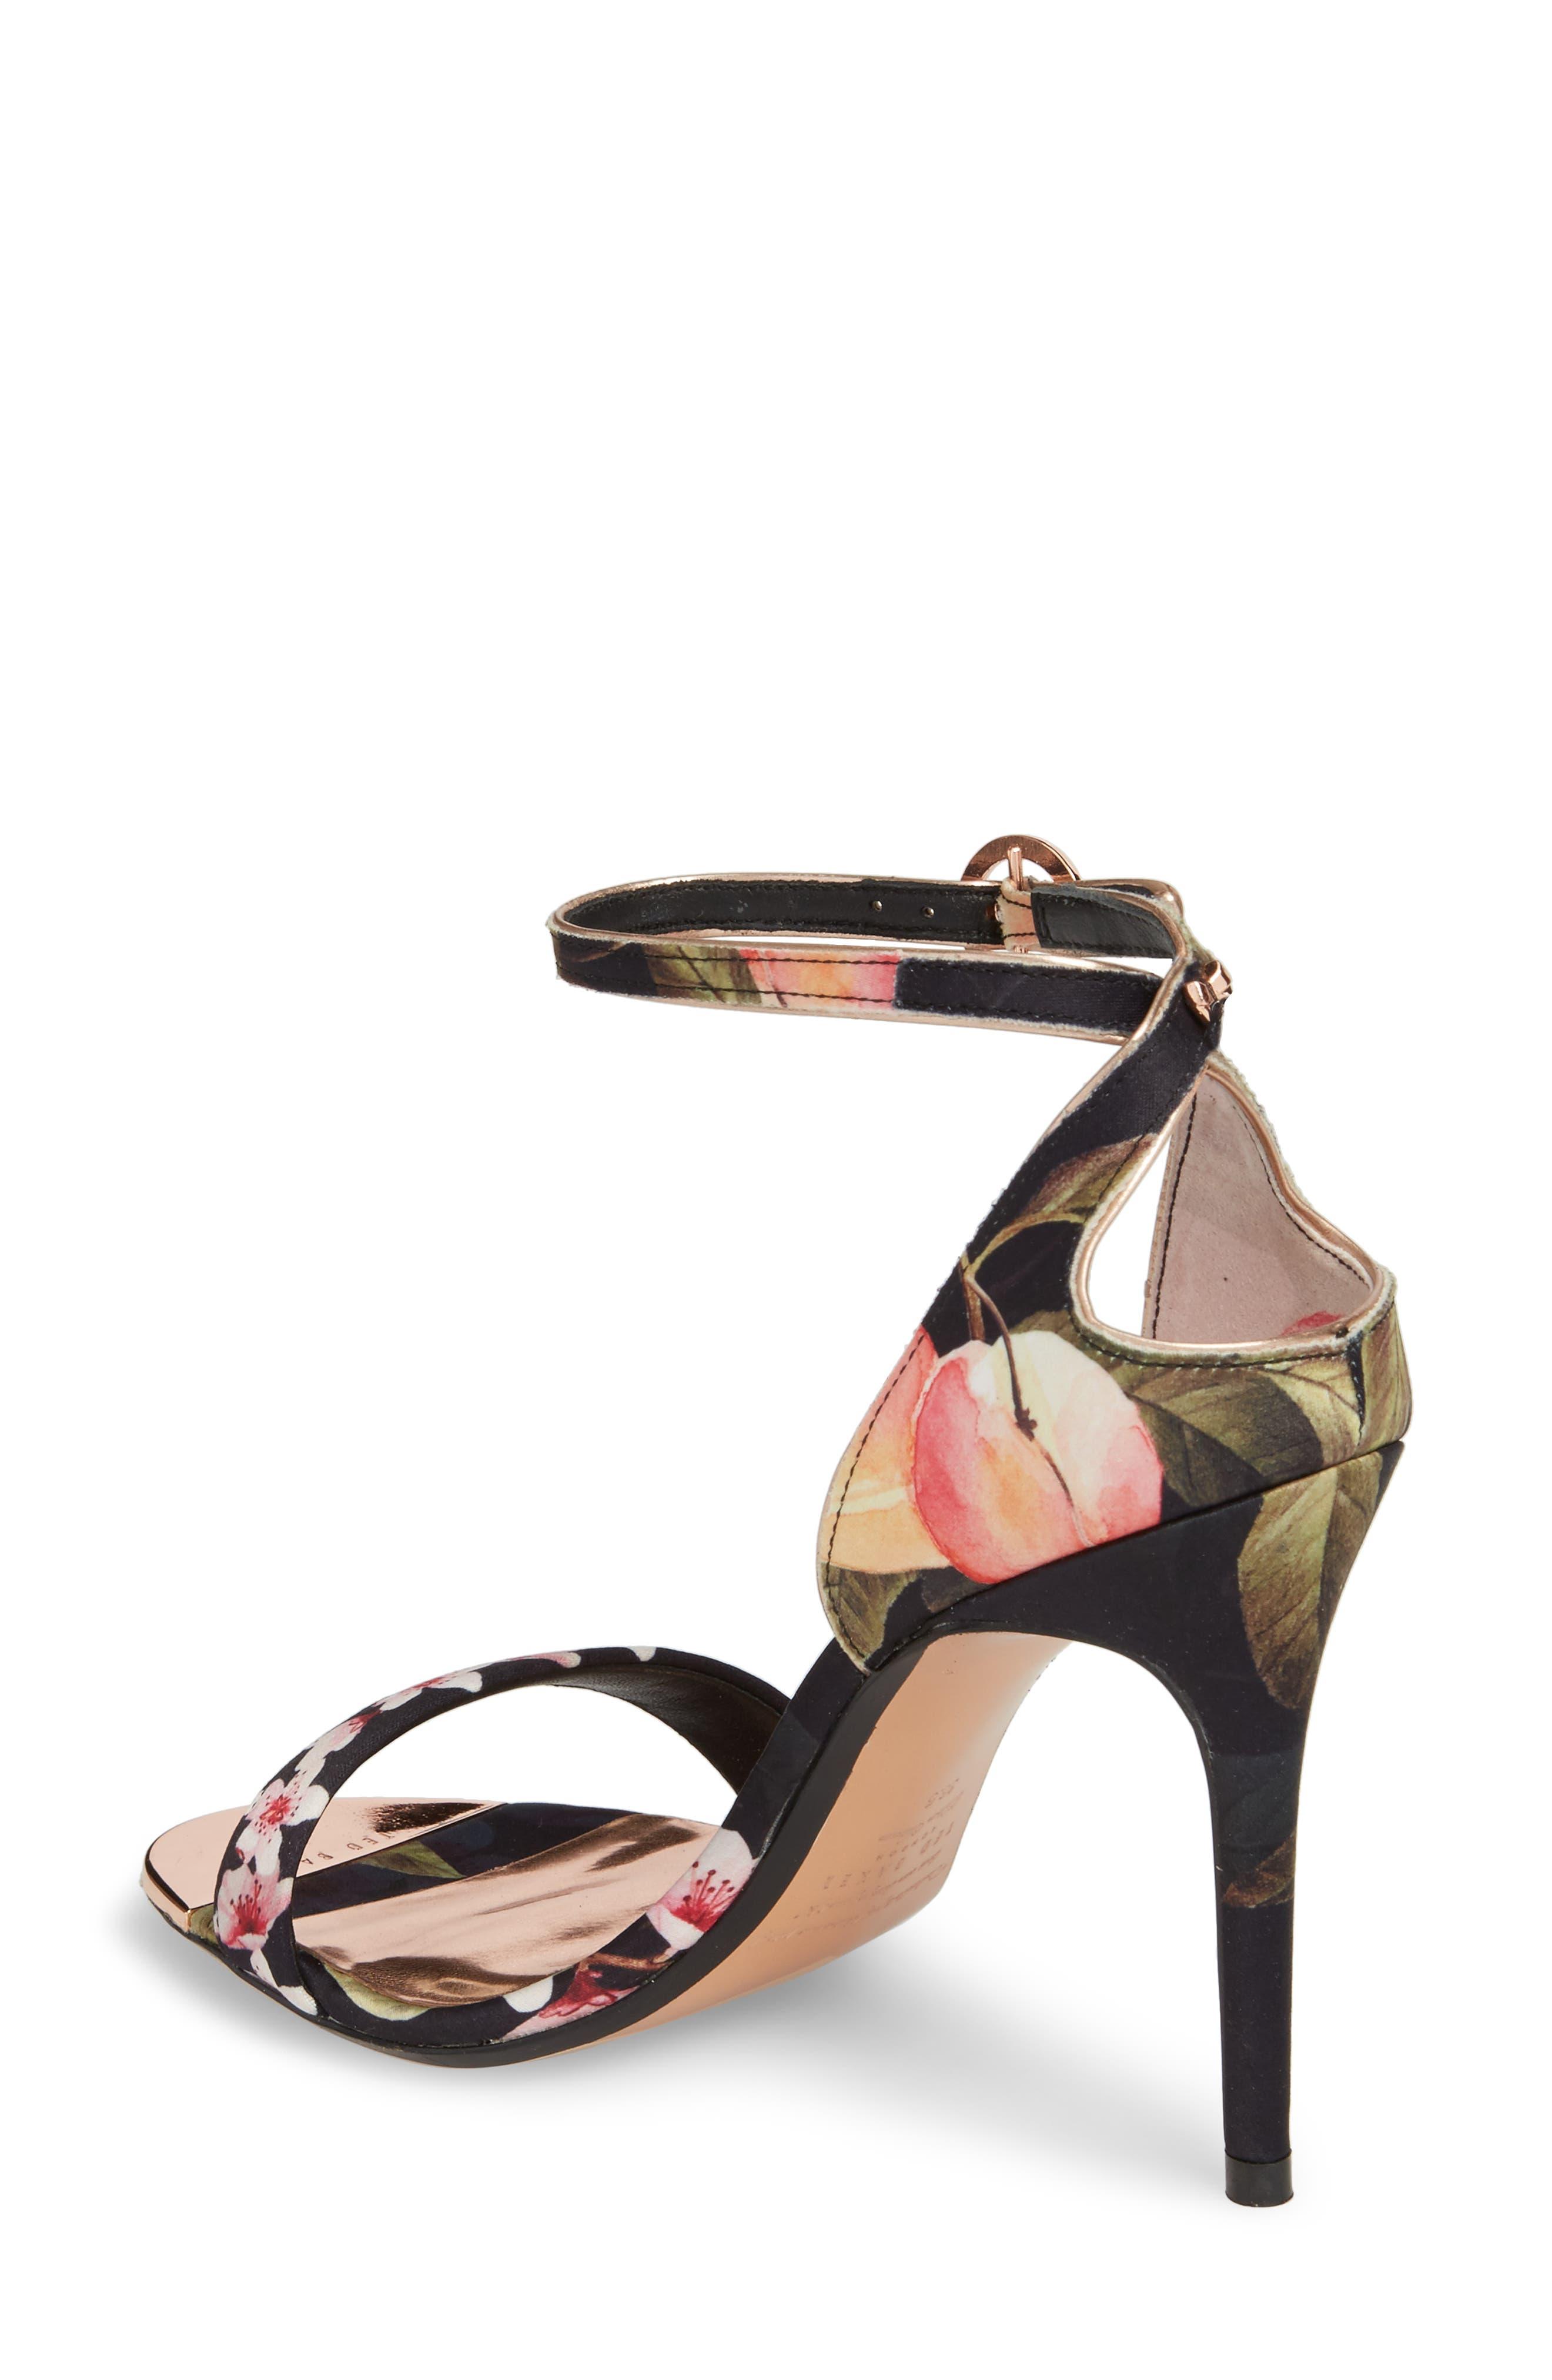 Mirobep Sandal,                             Alternate thumbnail 2, color,                             Peach Blossom Black Satin